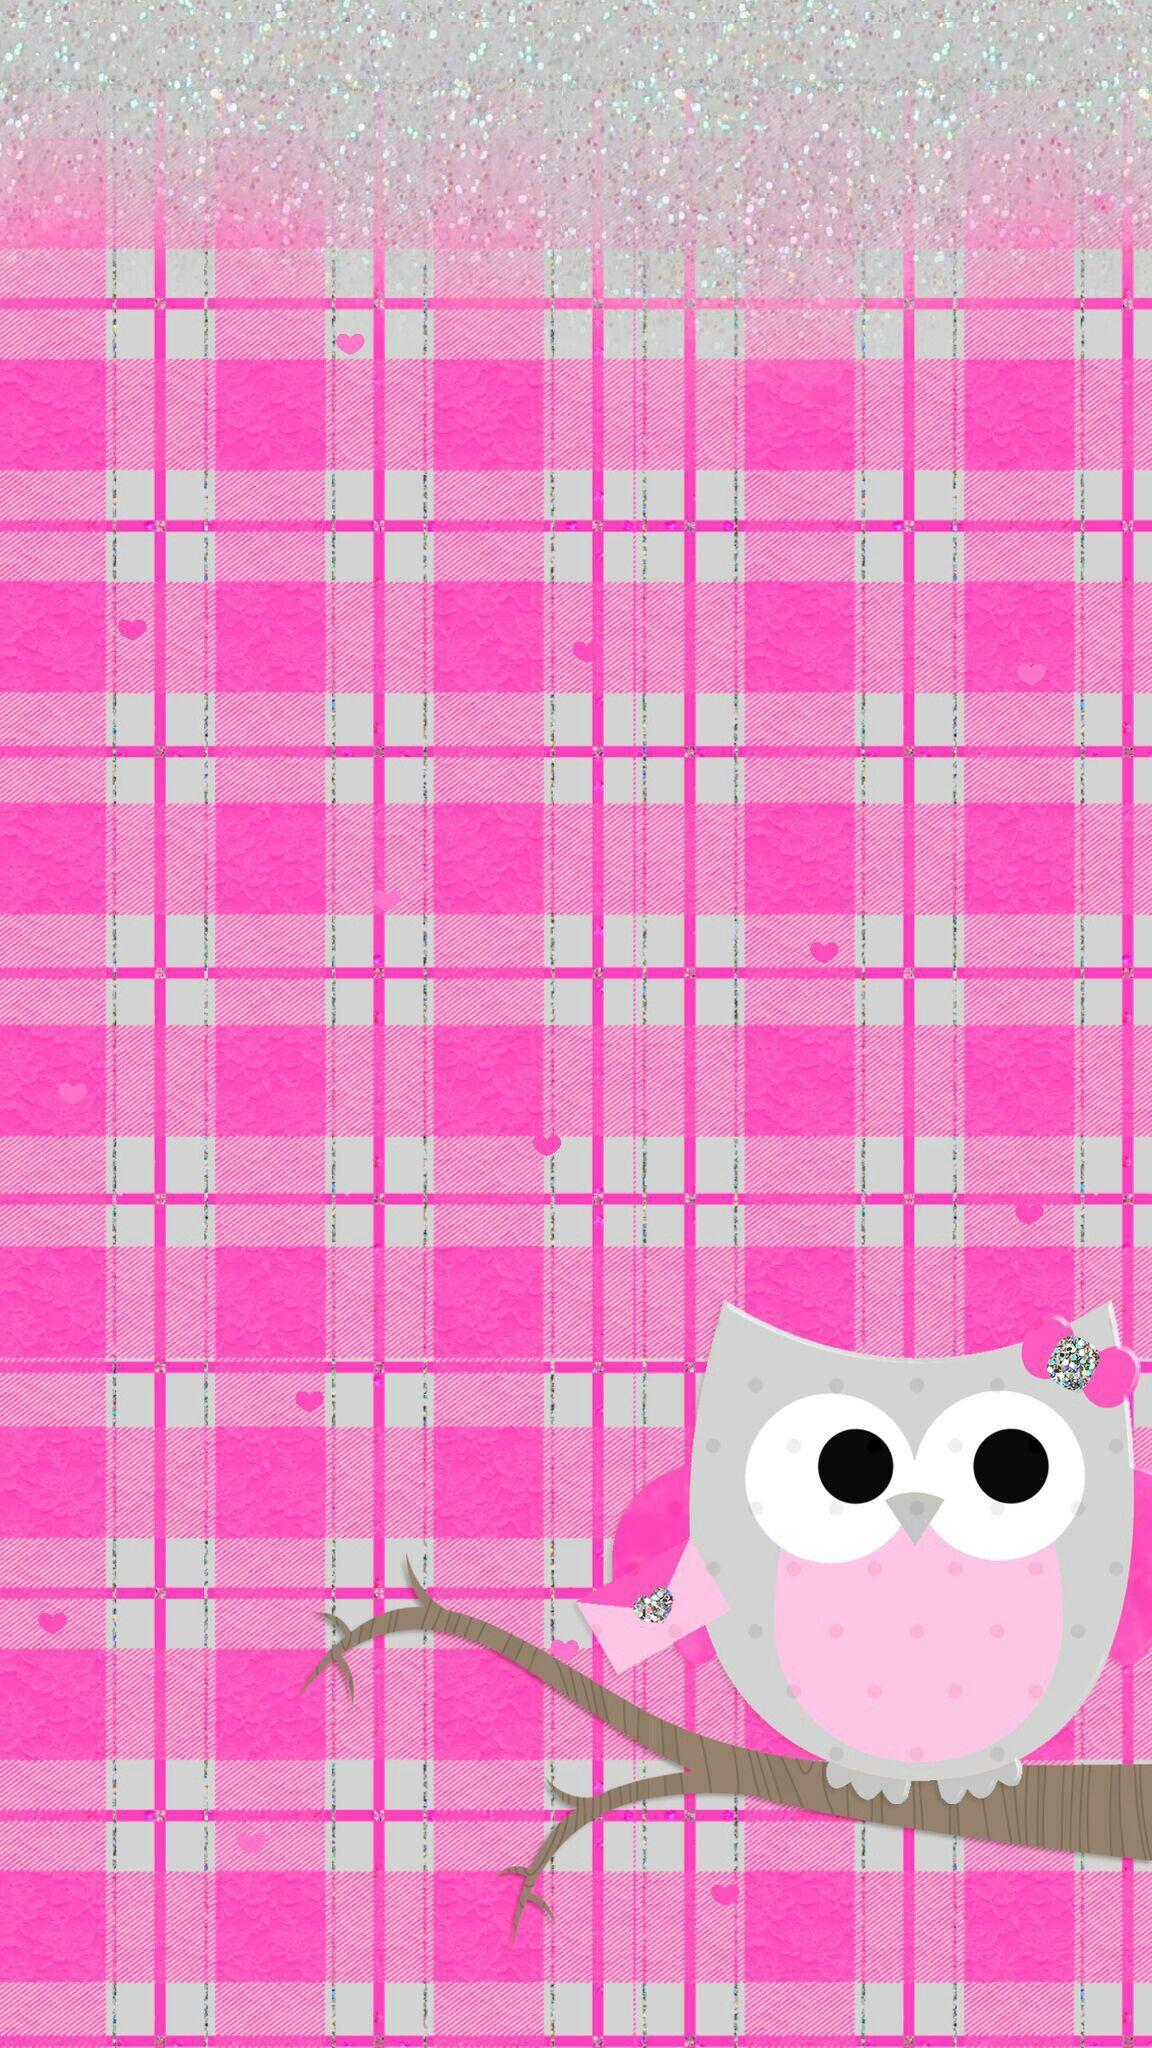 Pink Cute Owl Wallpaper Owls Wallpapers Pinterest Owl Jpg 1152x2048 Cute Girly Owl Backgrounds